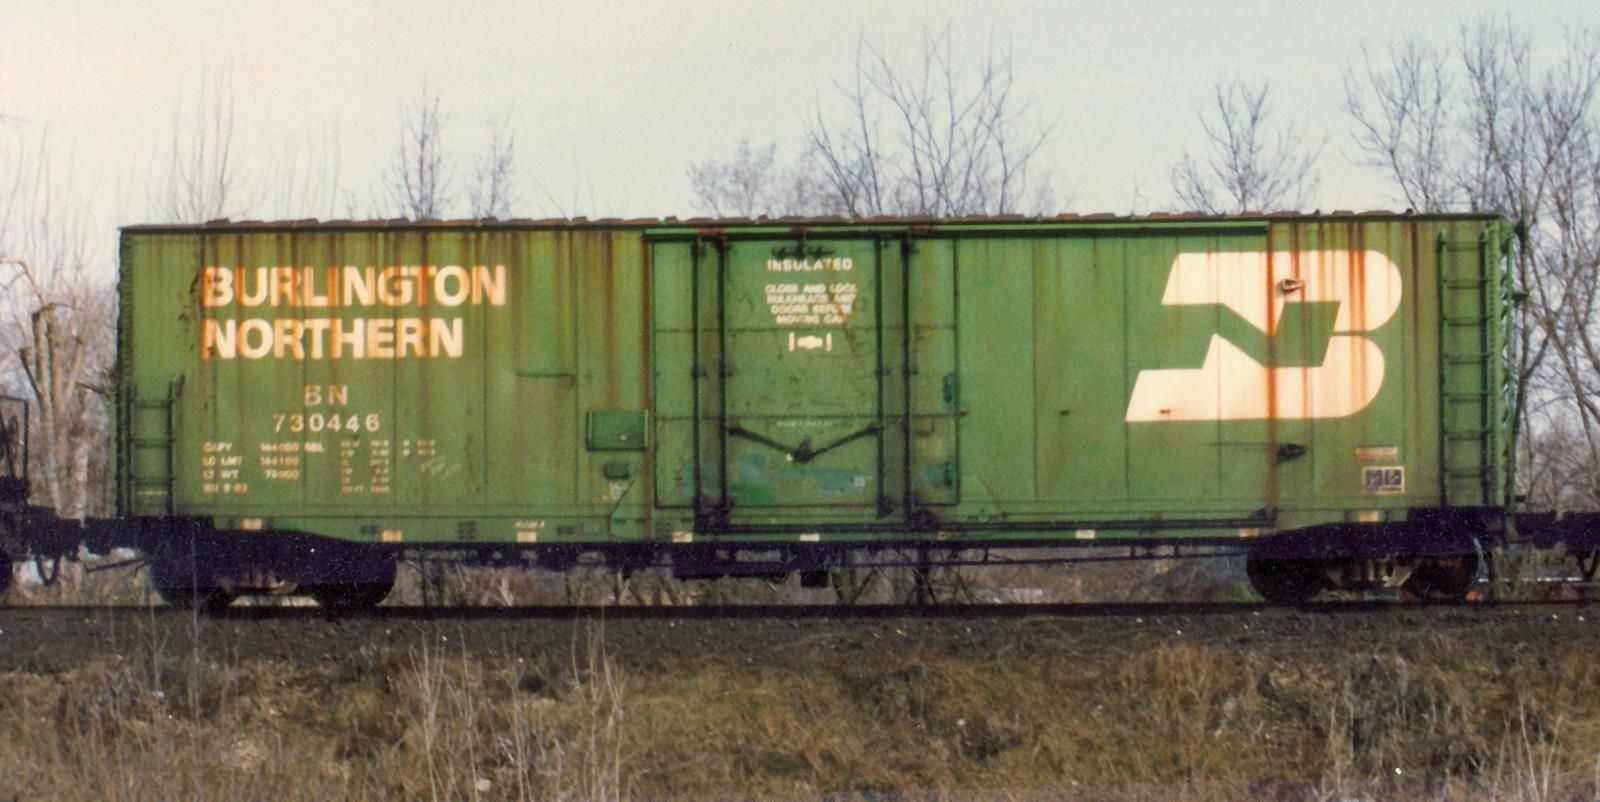 Bn 730445 50 boxcar burlington northern series builder